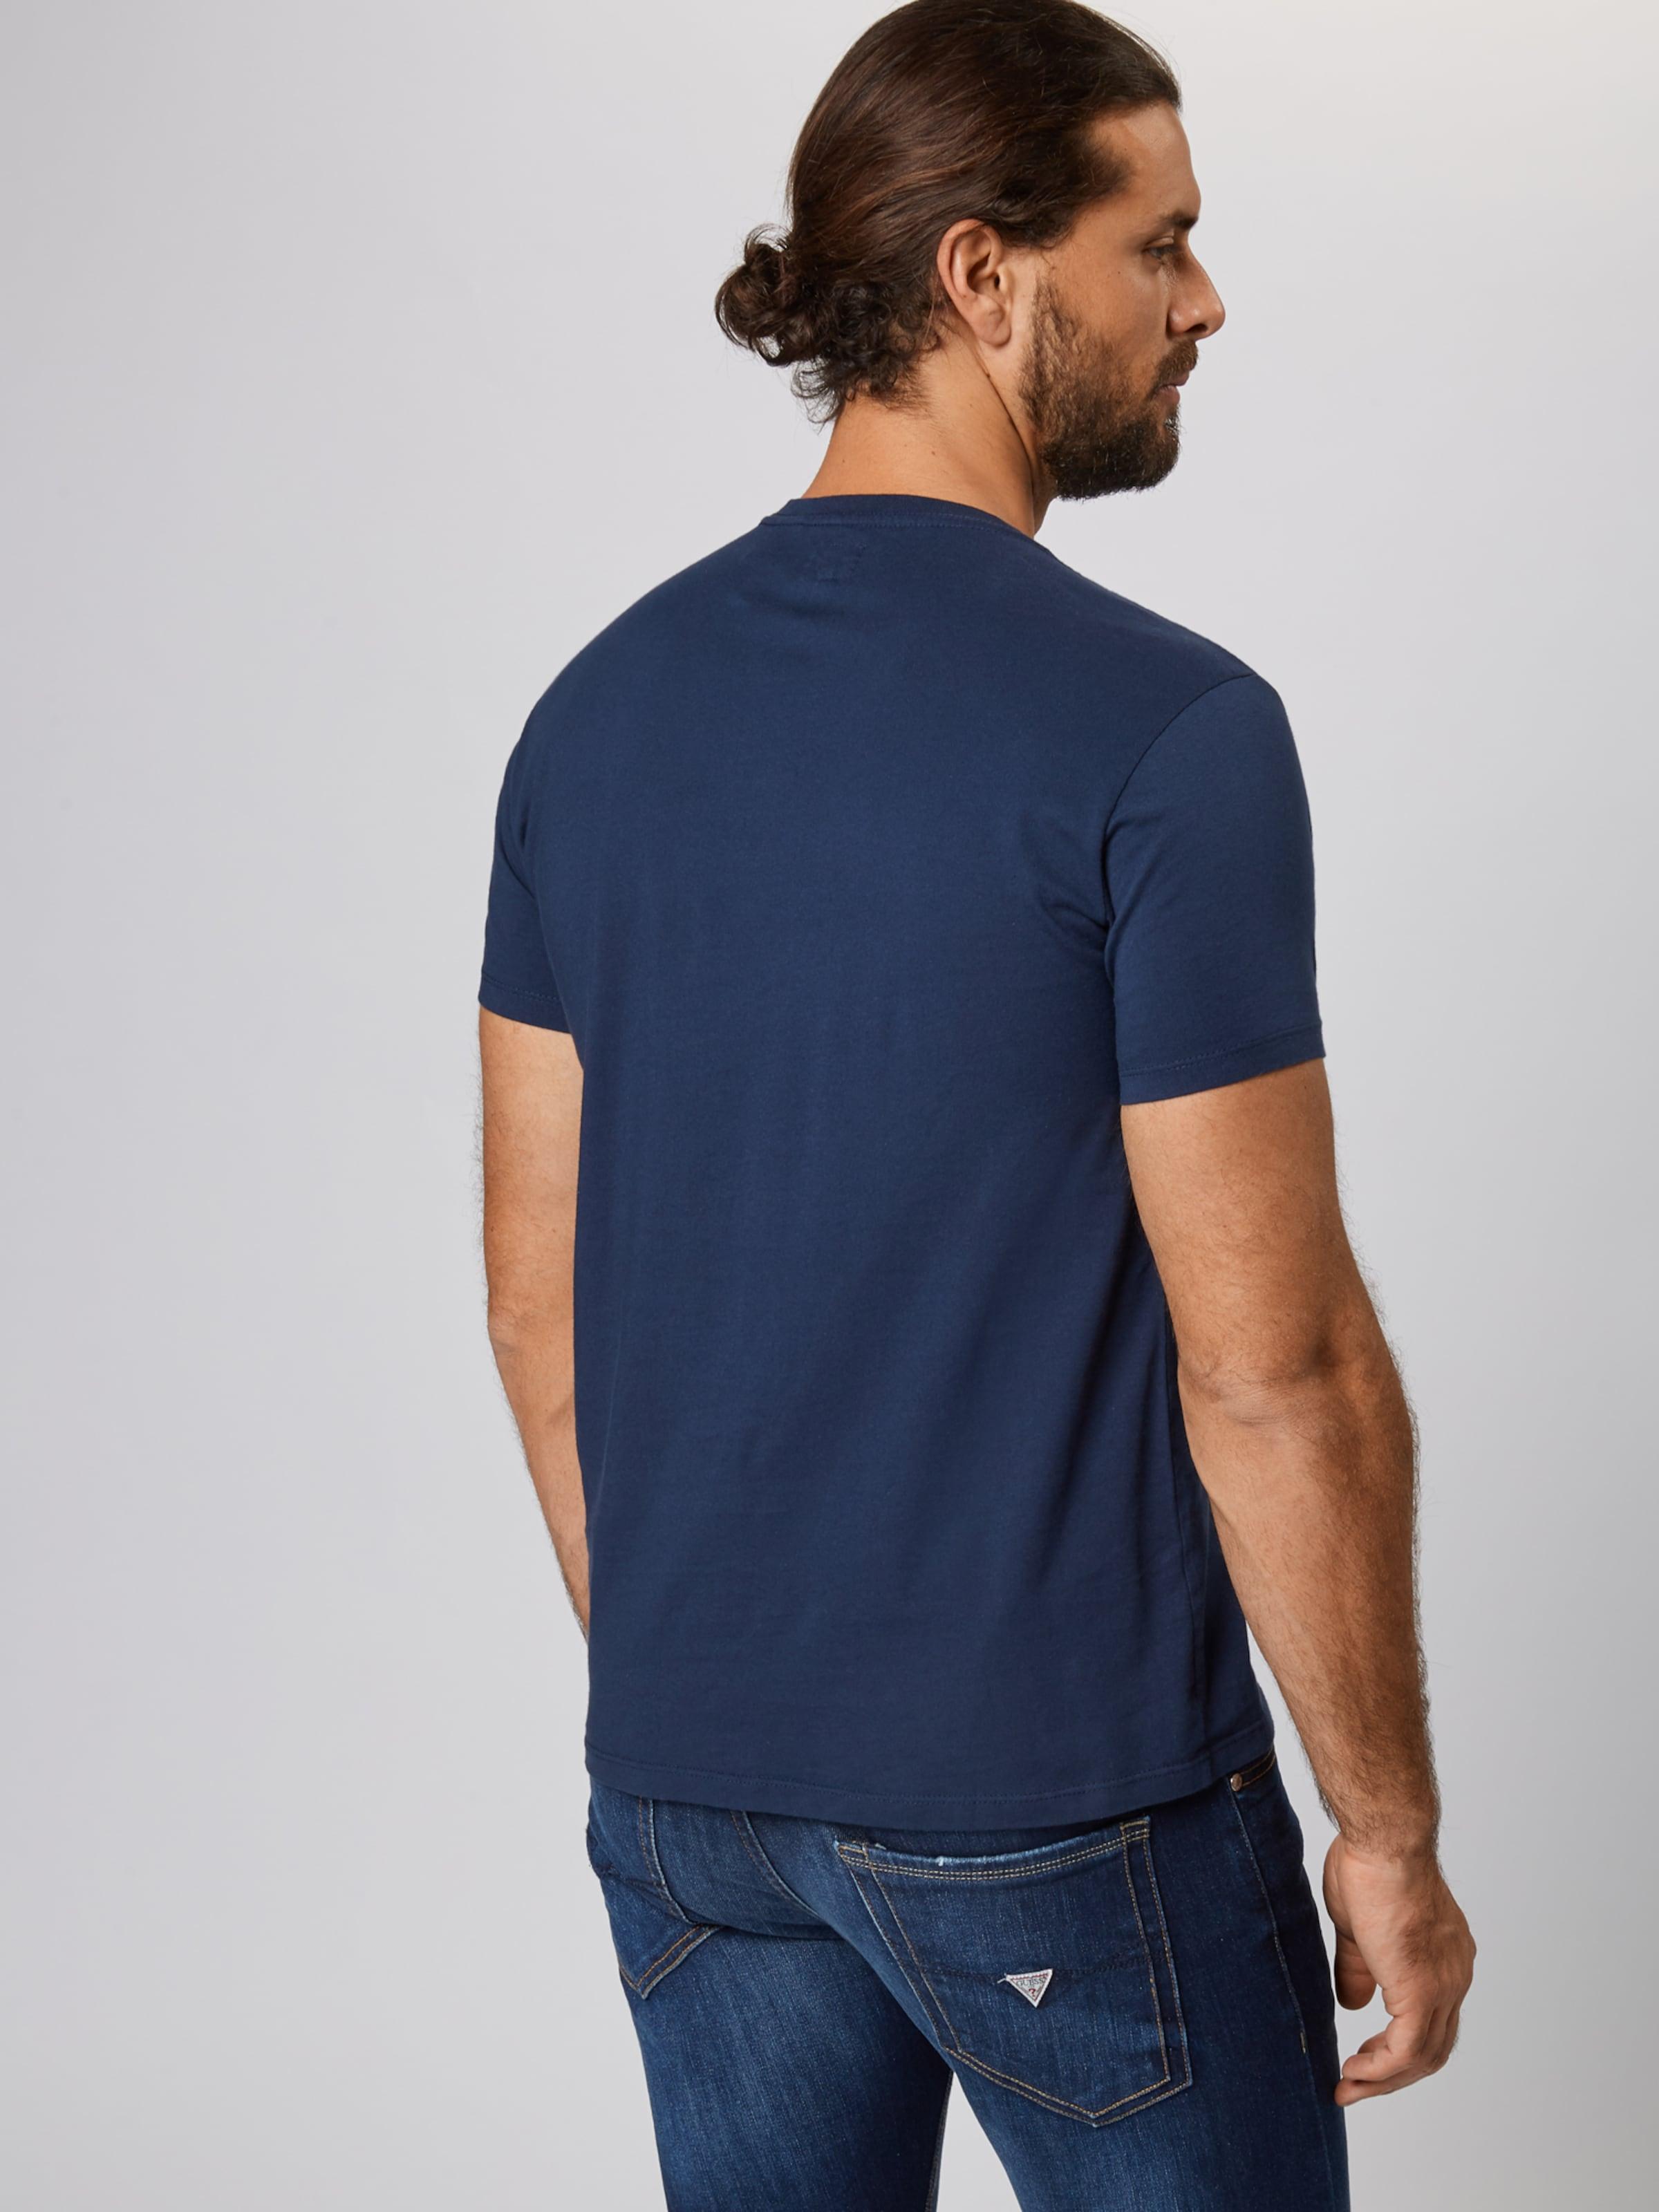 T En shirt 'orighmvneck' Bleu Levi's Foncé 5jc4RLq3A